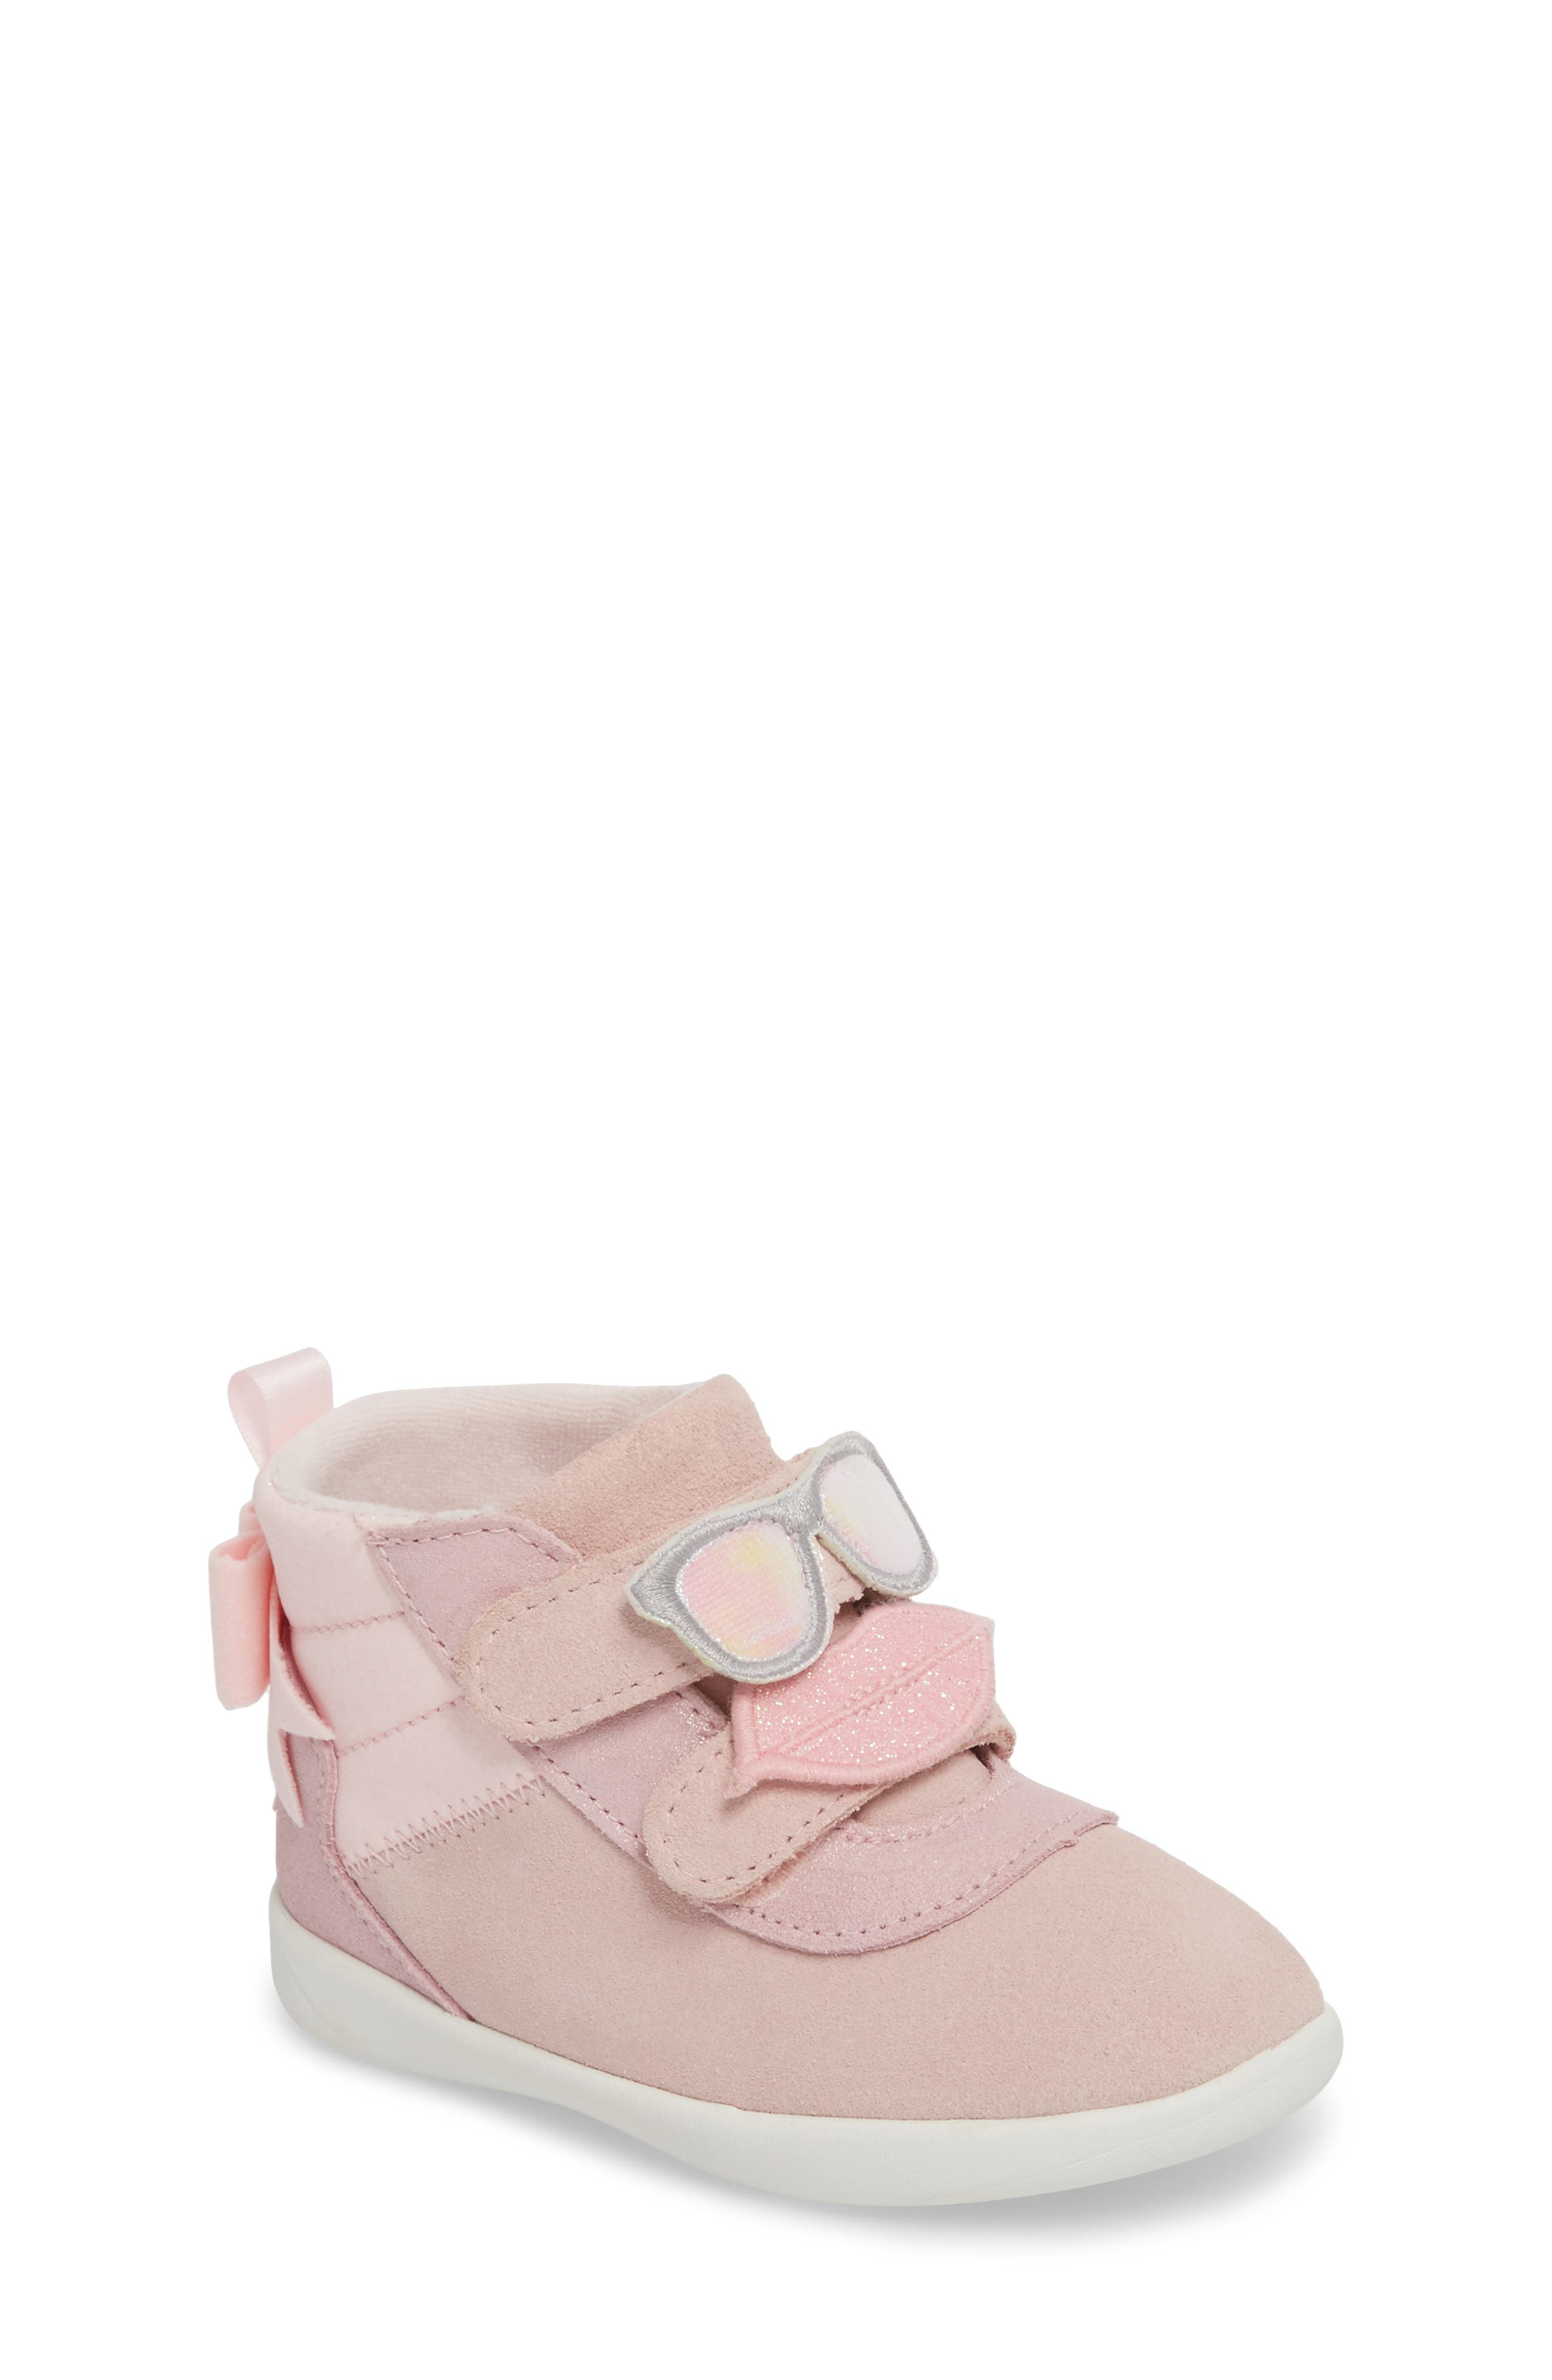 Livv Sunglass Appliqué Sneaker,                         Main,                         color, Seashell Pink